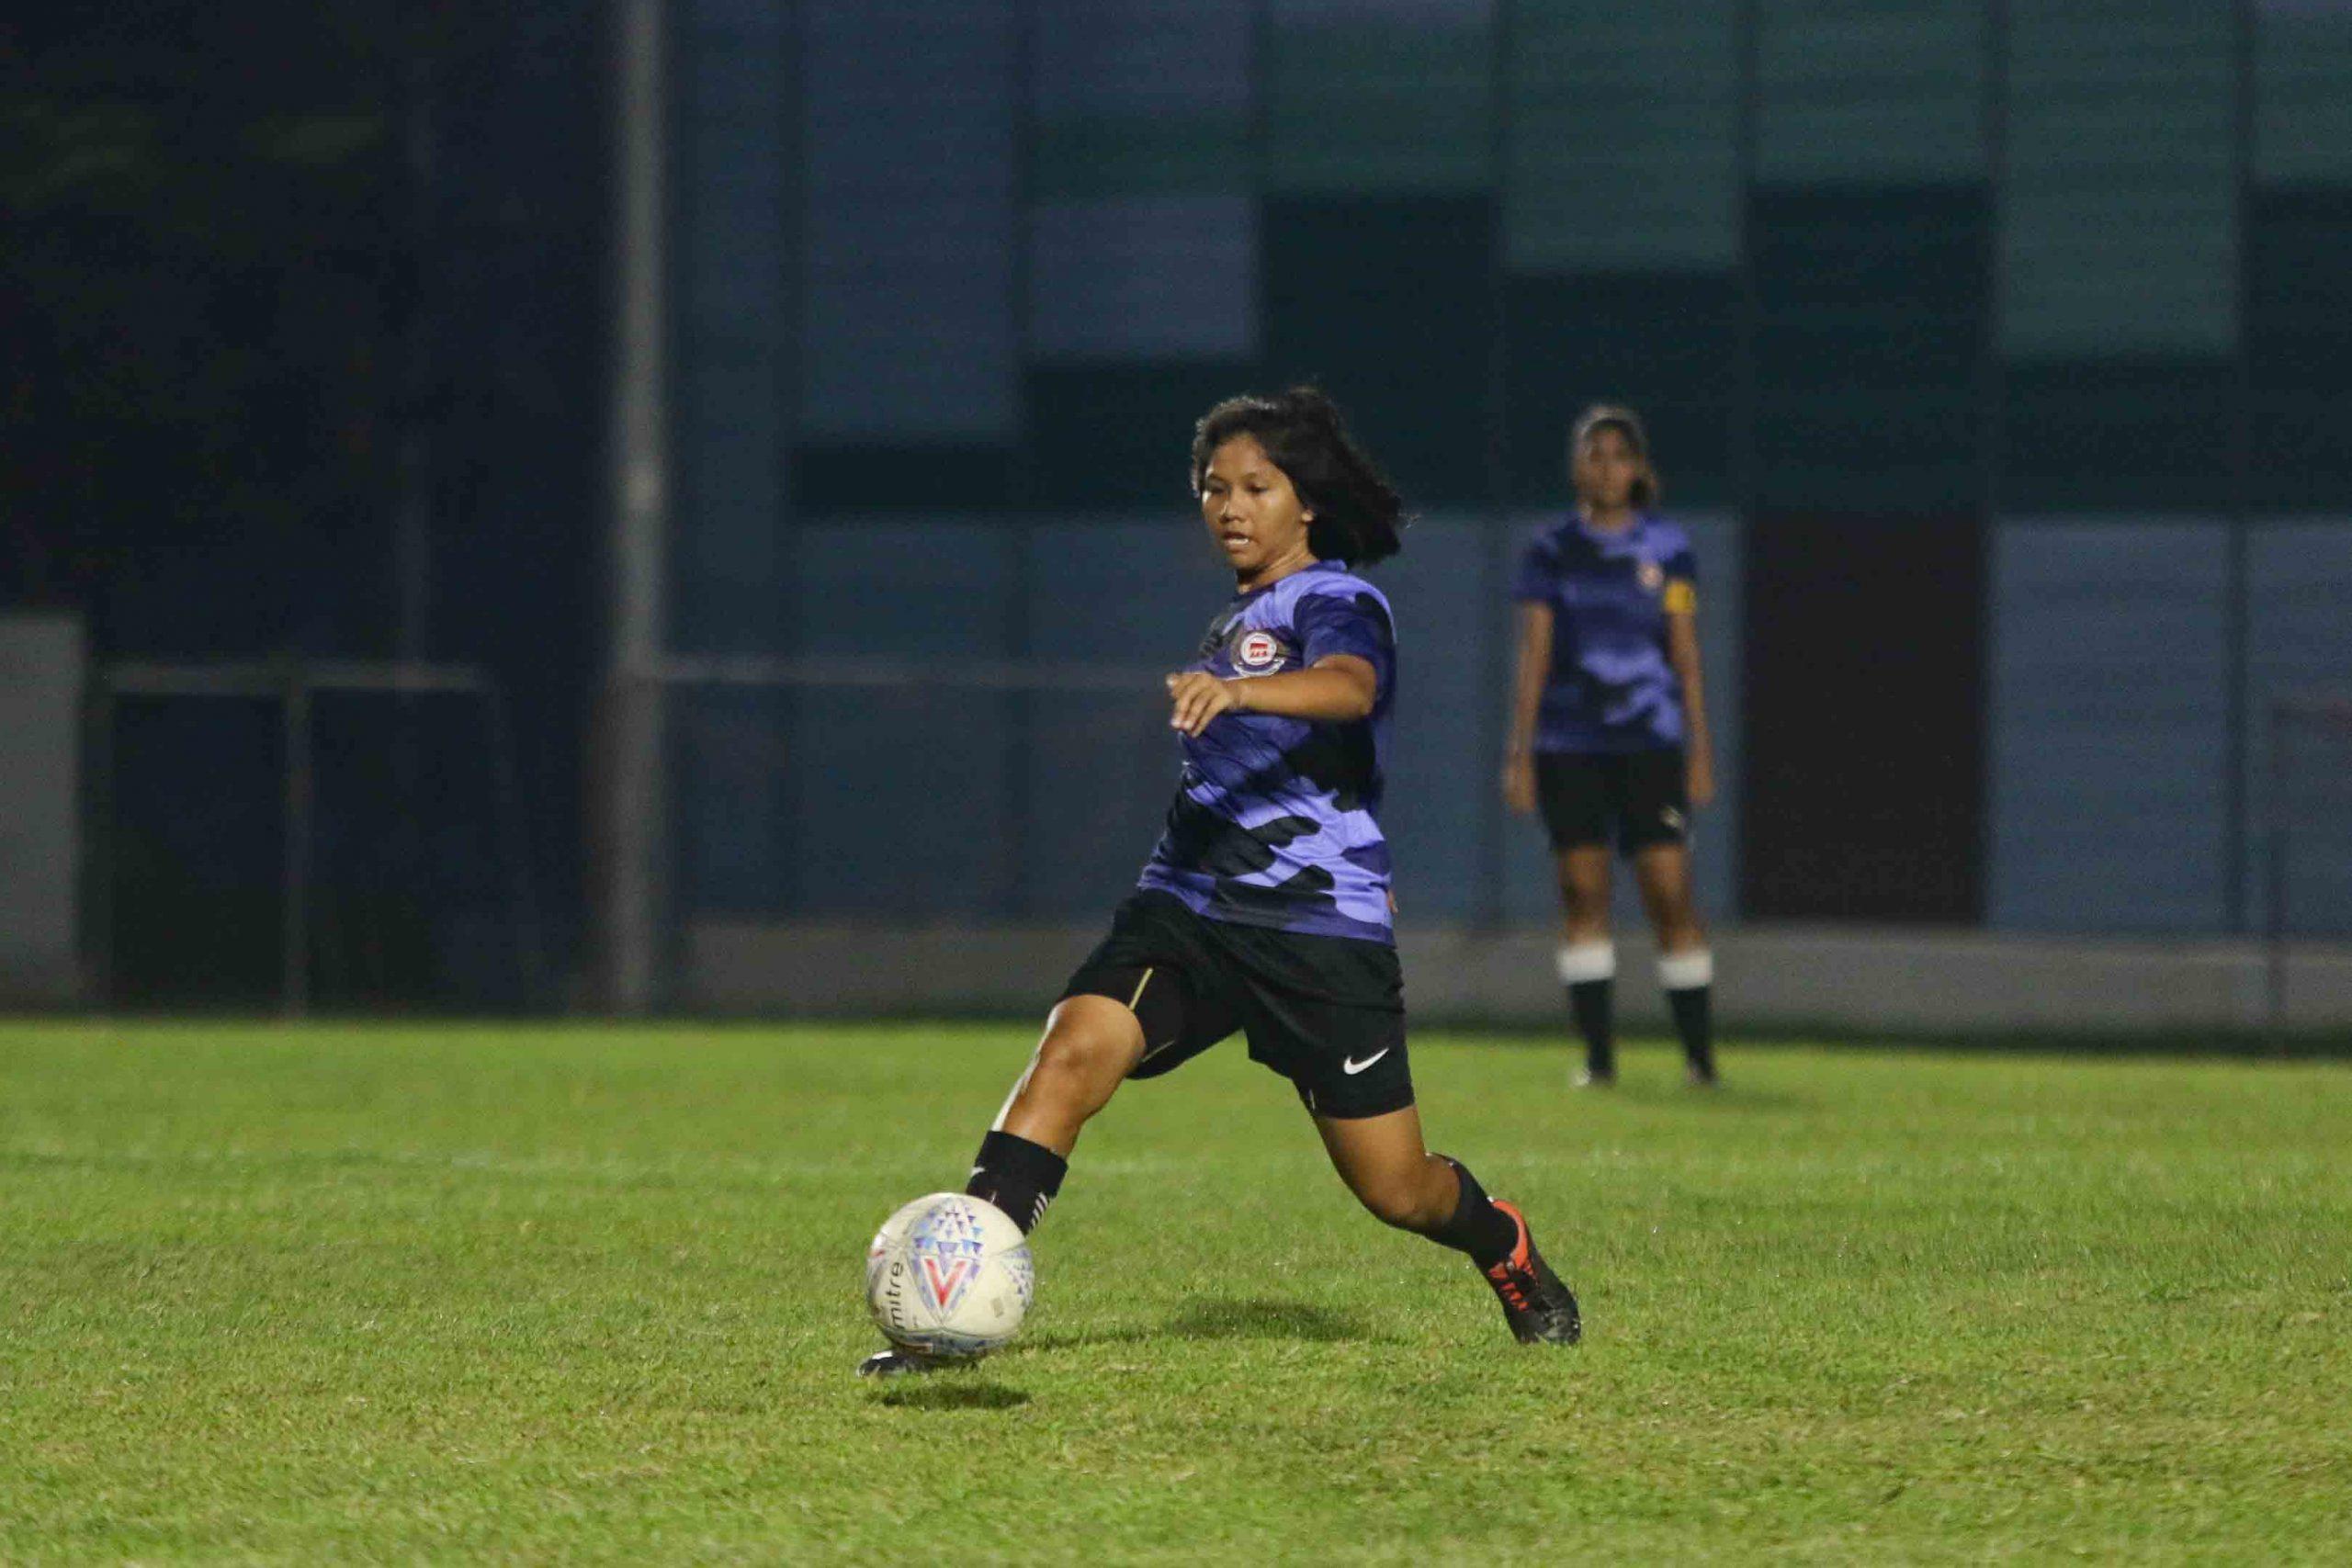 Nur Syazwani Binte Mohammad Ruzi (#8) makes a pass from midfield. (Photo 7 © Clara Lau/Red Sports)